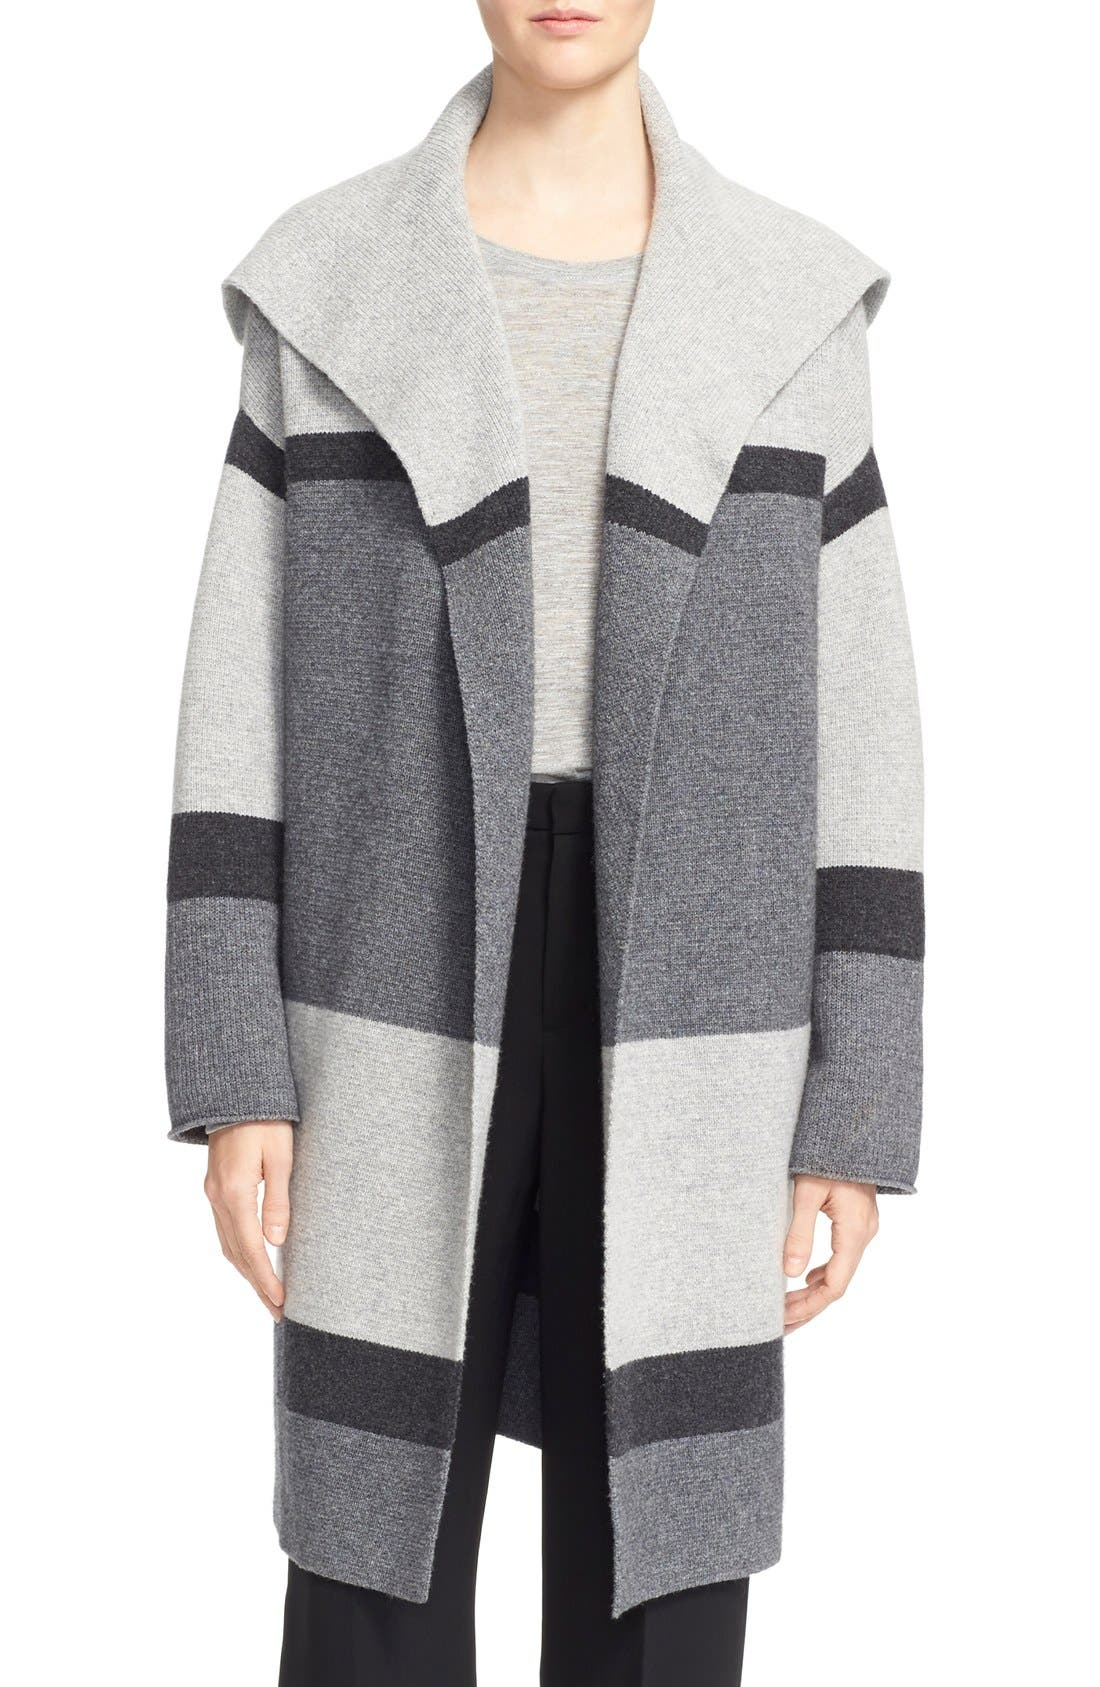 Main Image - Vince Colorblock Wool & Cashmere Knit Car Coat